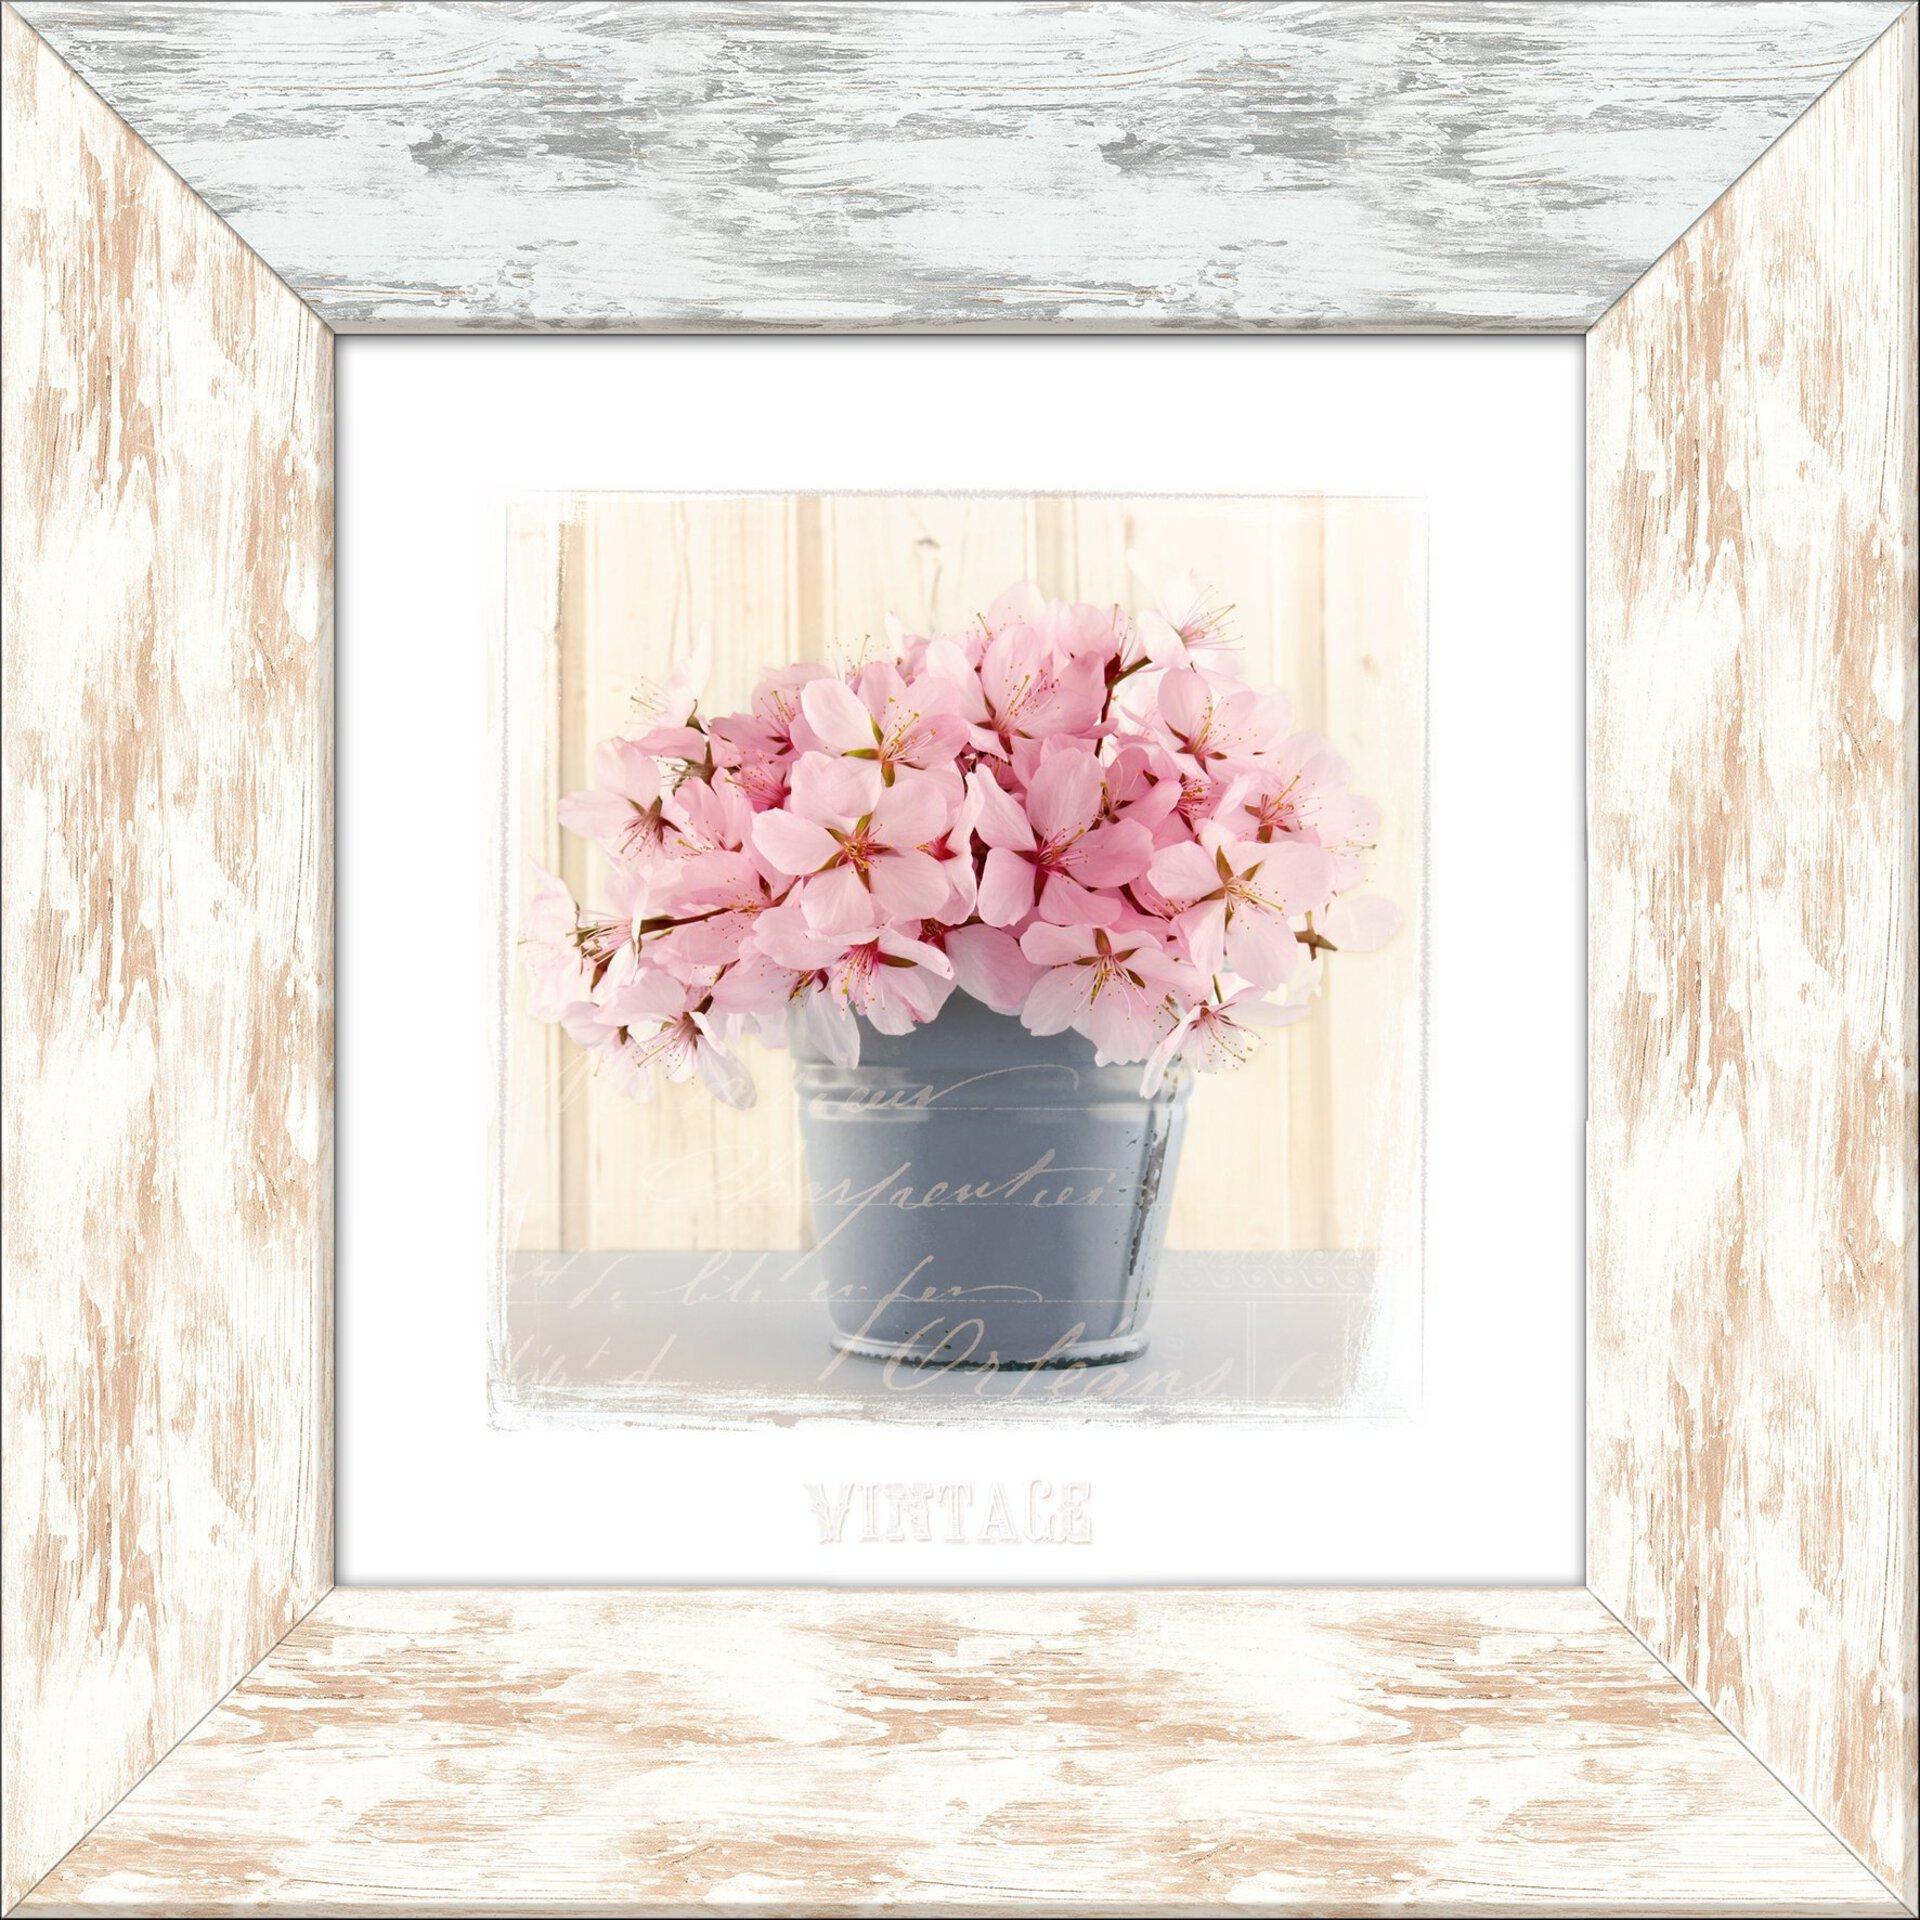 Bild Herbstrose I Pro-Art Holzwerkstoff mehrfarbig 44 x 44 x 1 cm